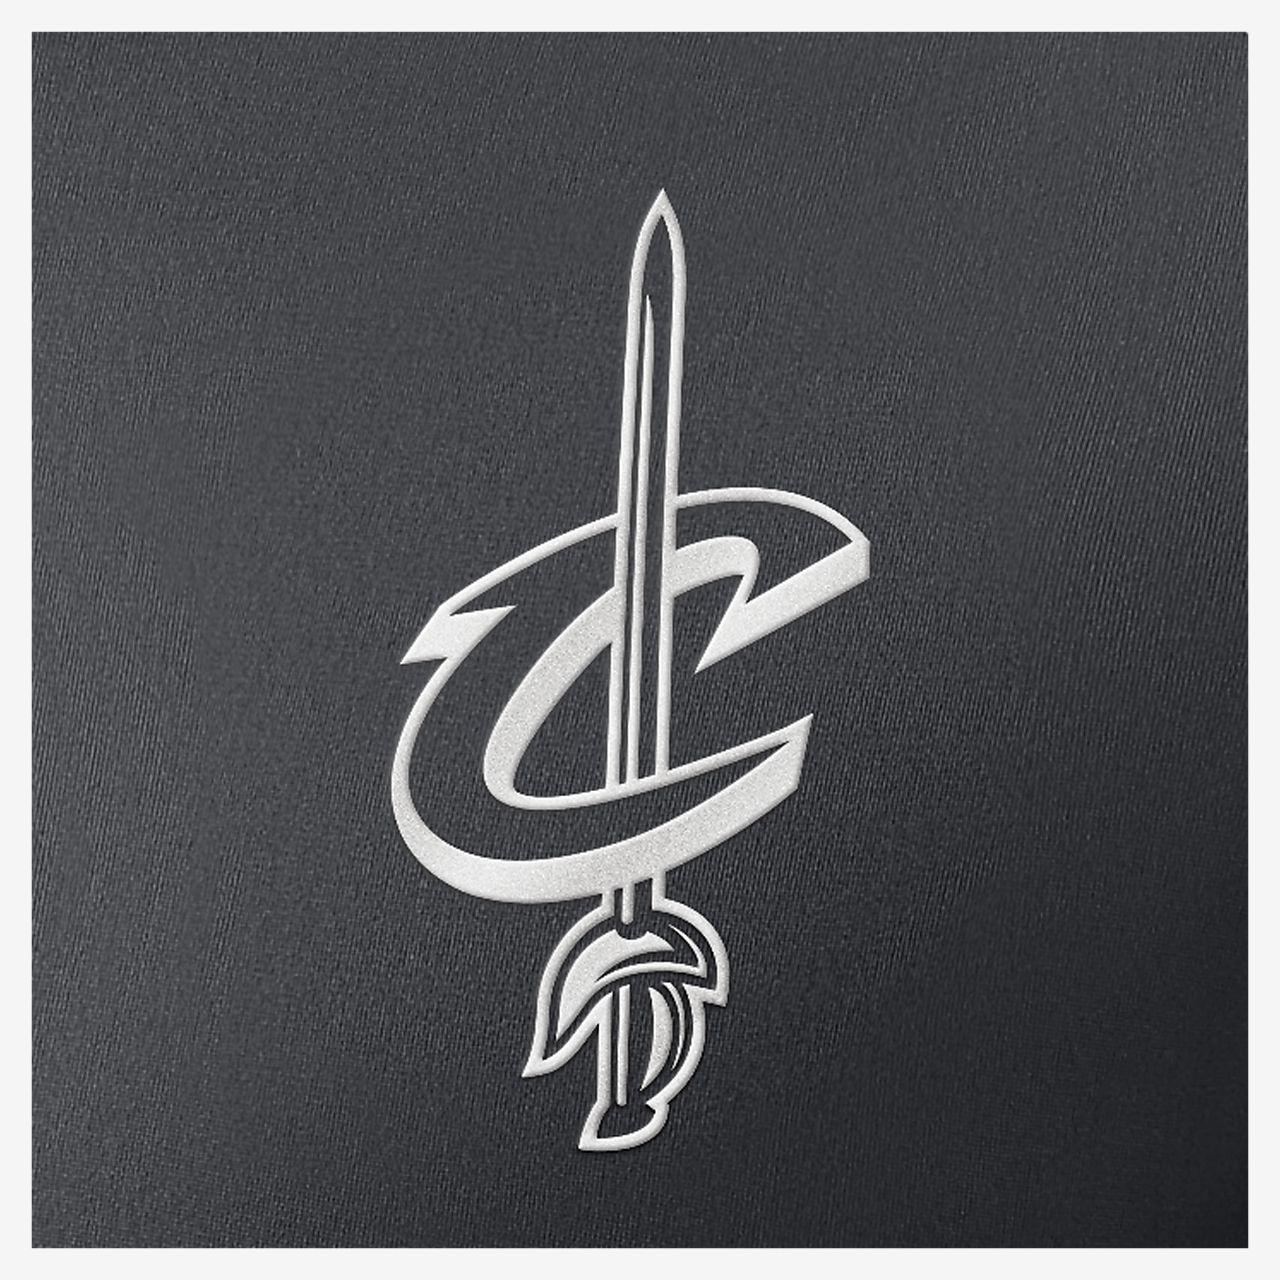 679795f61914 Cleveland Cavaliers Nike Hyper Elite Men s Long-Sleeve NBA Top. Nike ...